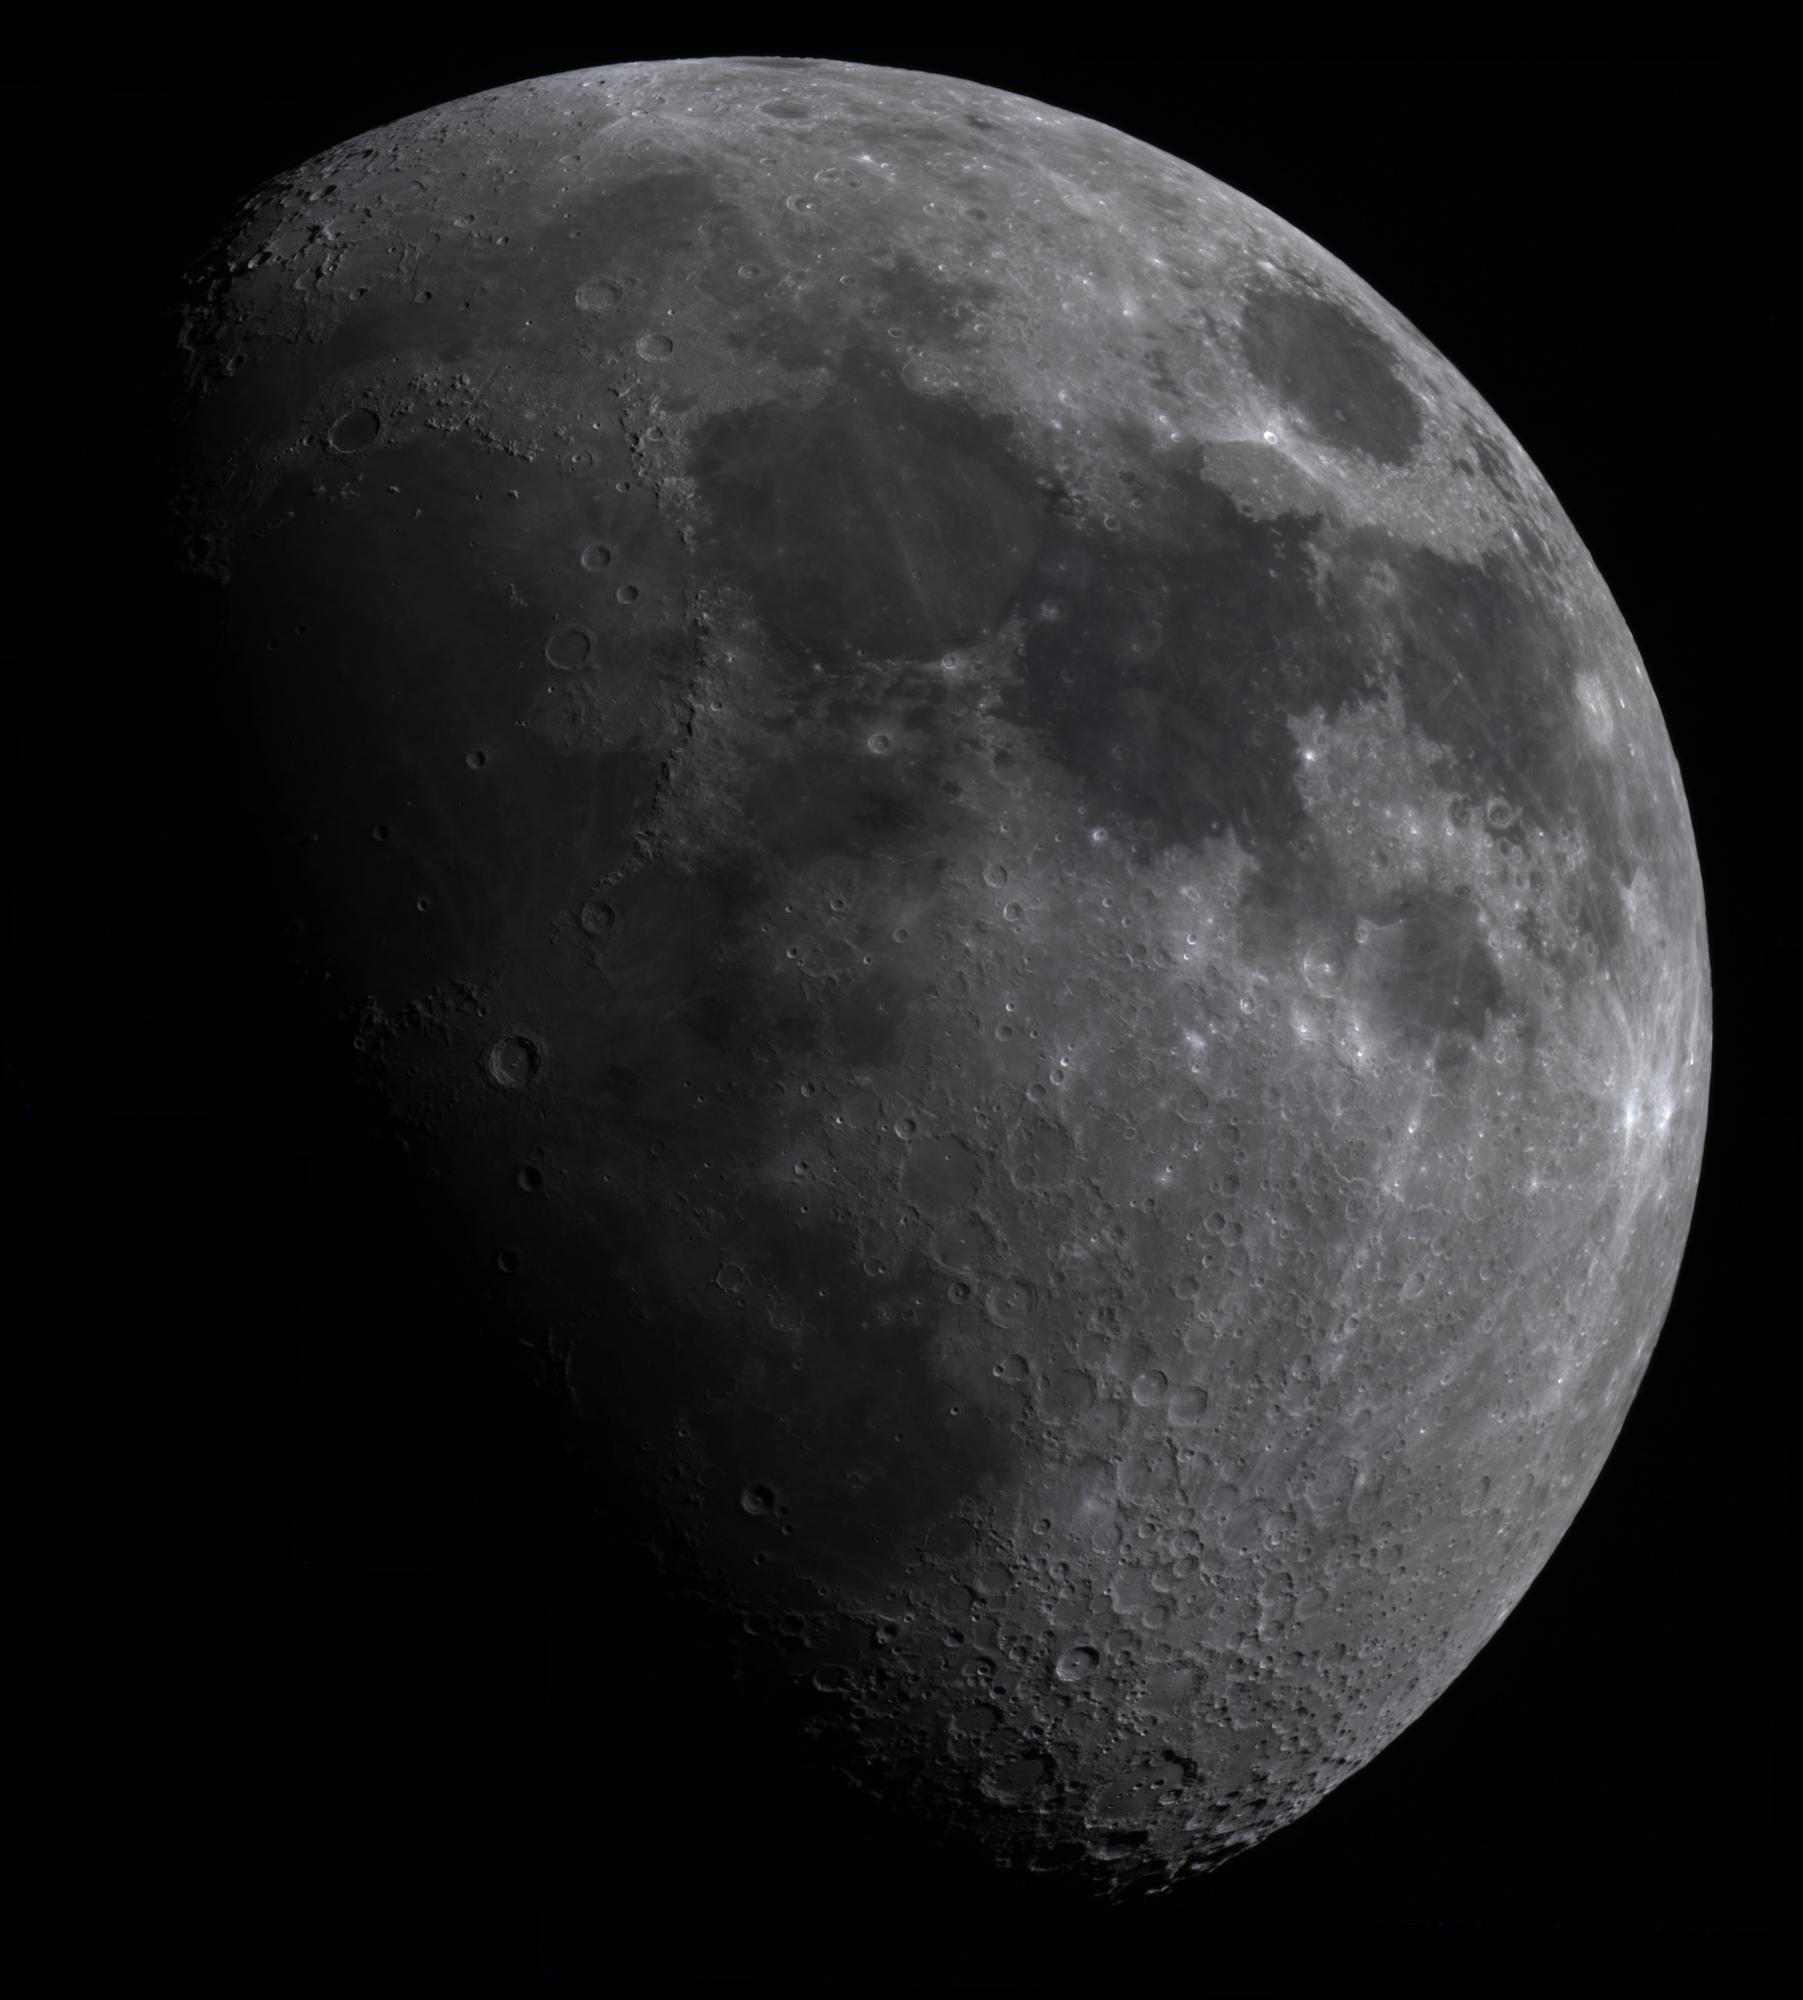 pano_lune.thumb.jpg.f3d9552df1f5ecc0f904d8cb0a223338.jpg